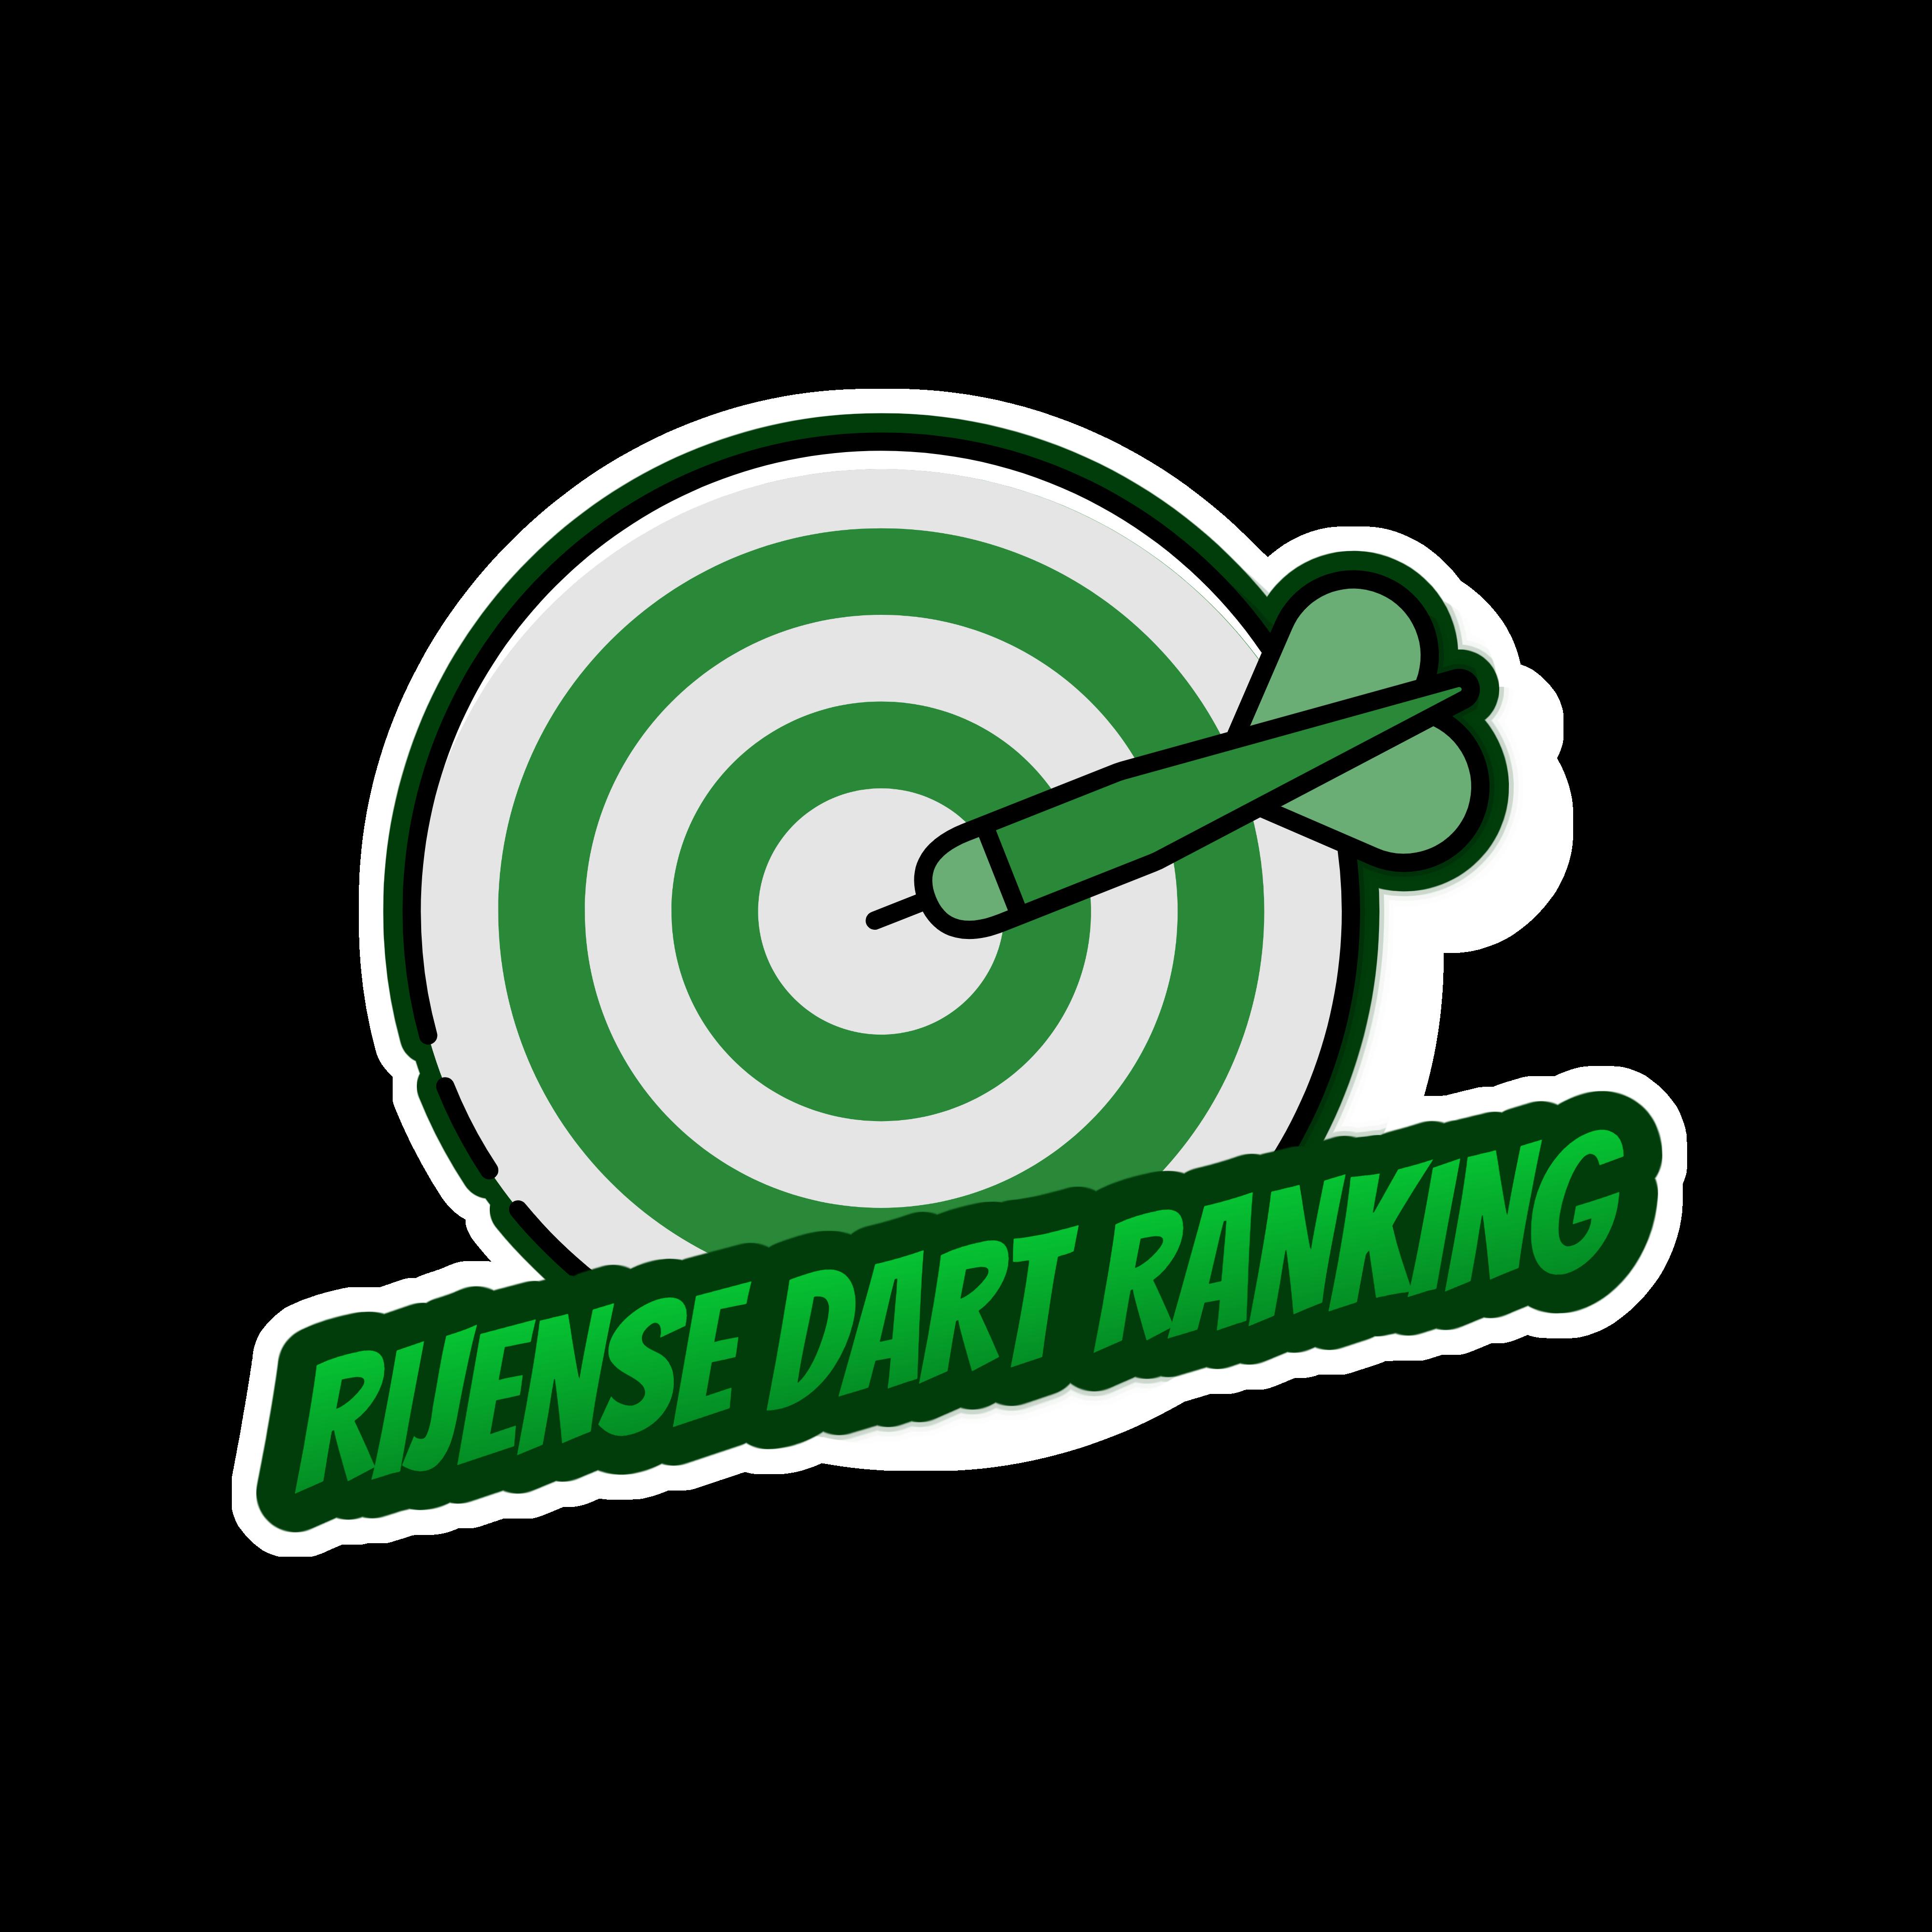 Rijense Dart Ranking